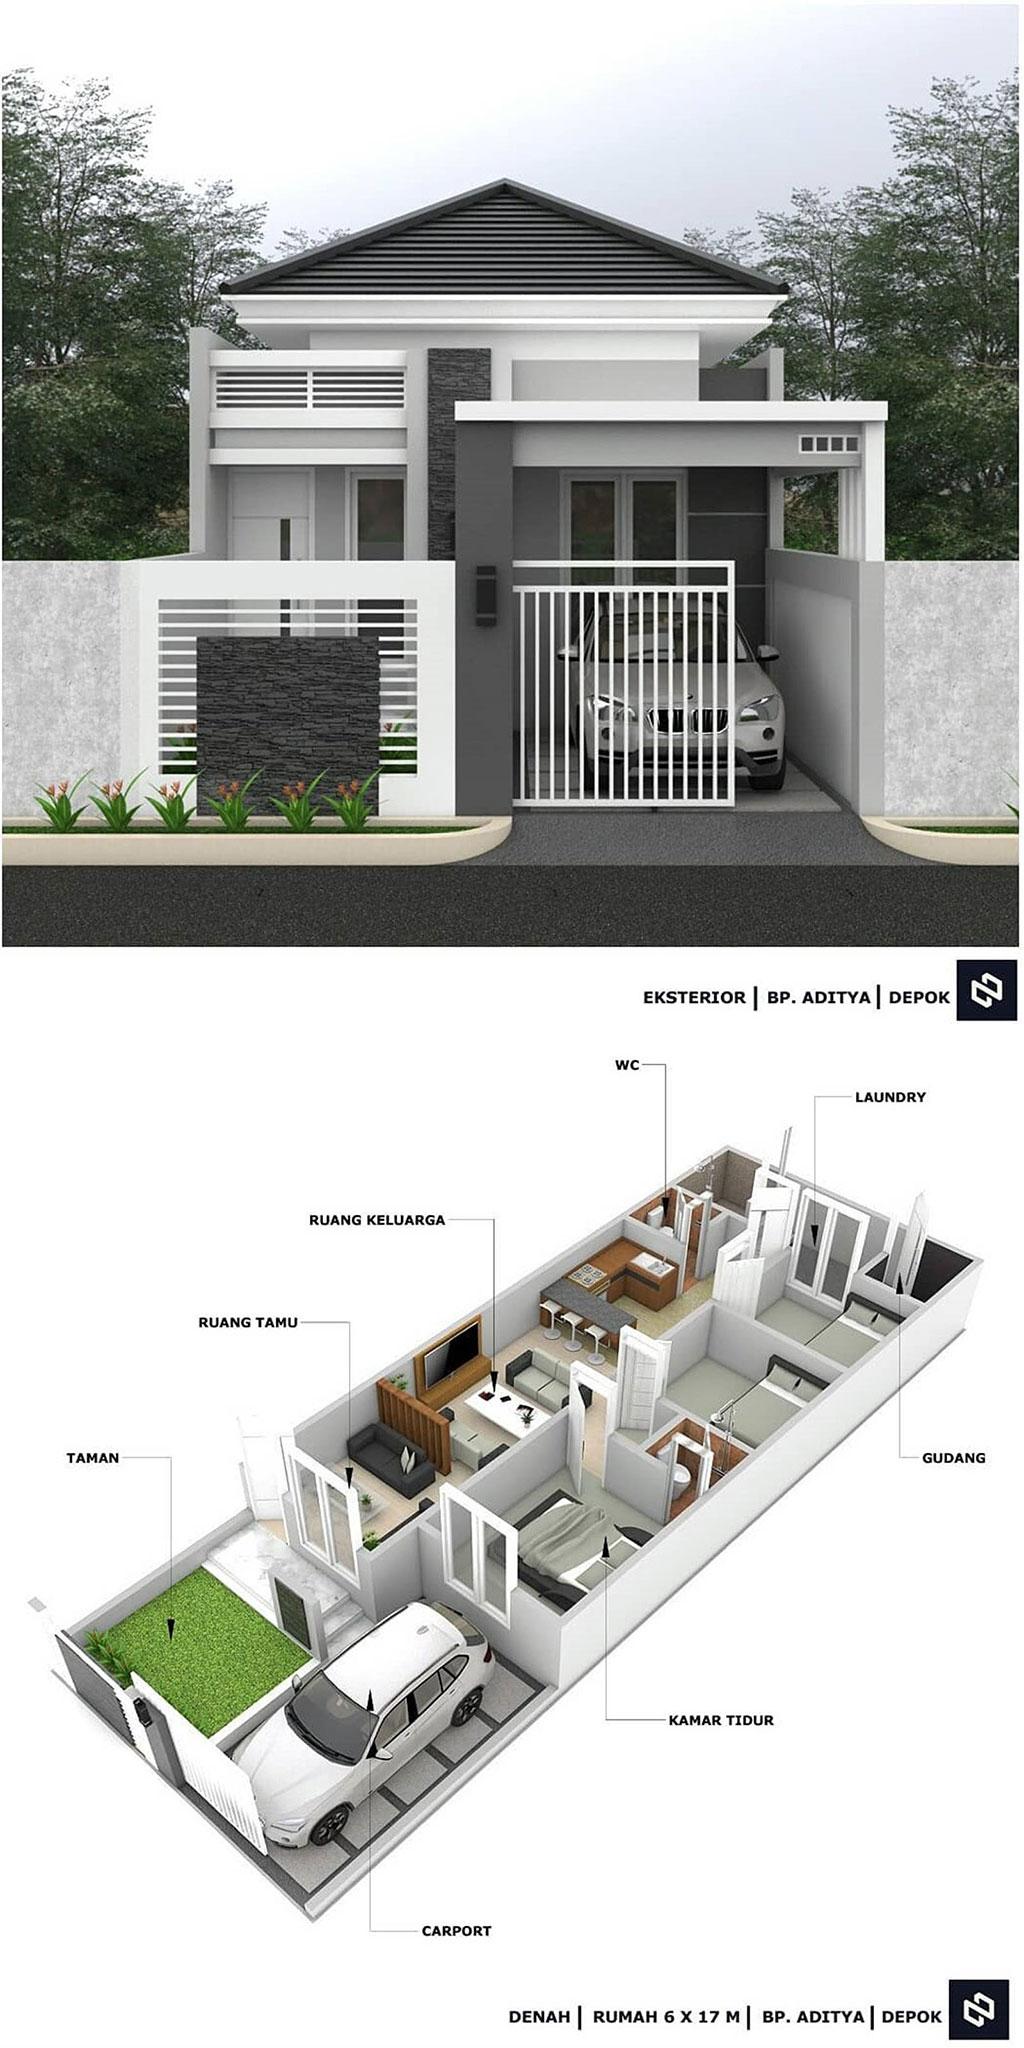 Denah Rumah Minimalis 3 Kamar Tidur 6x17m 1 Lantai Beserta Keterangannya